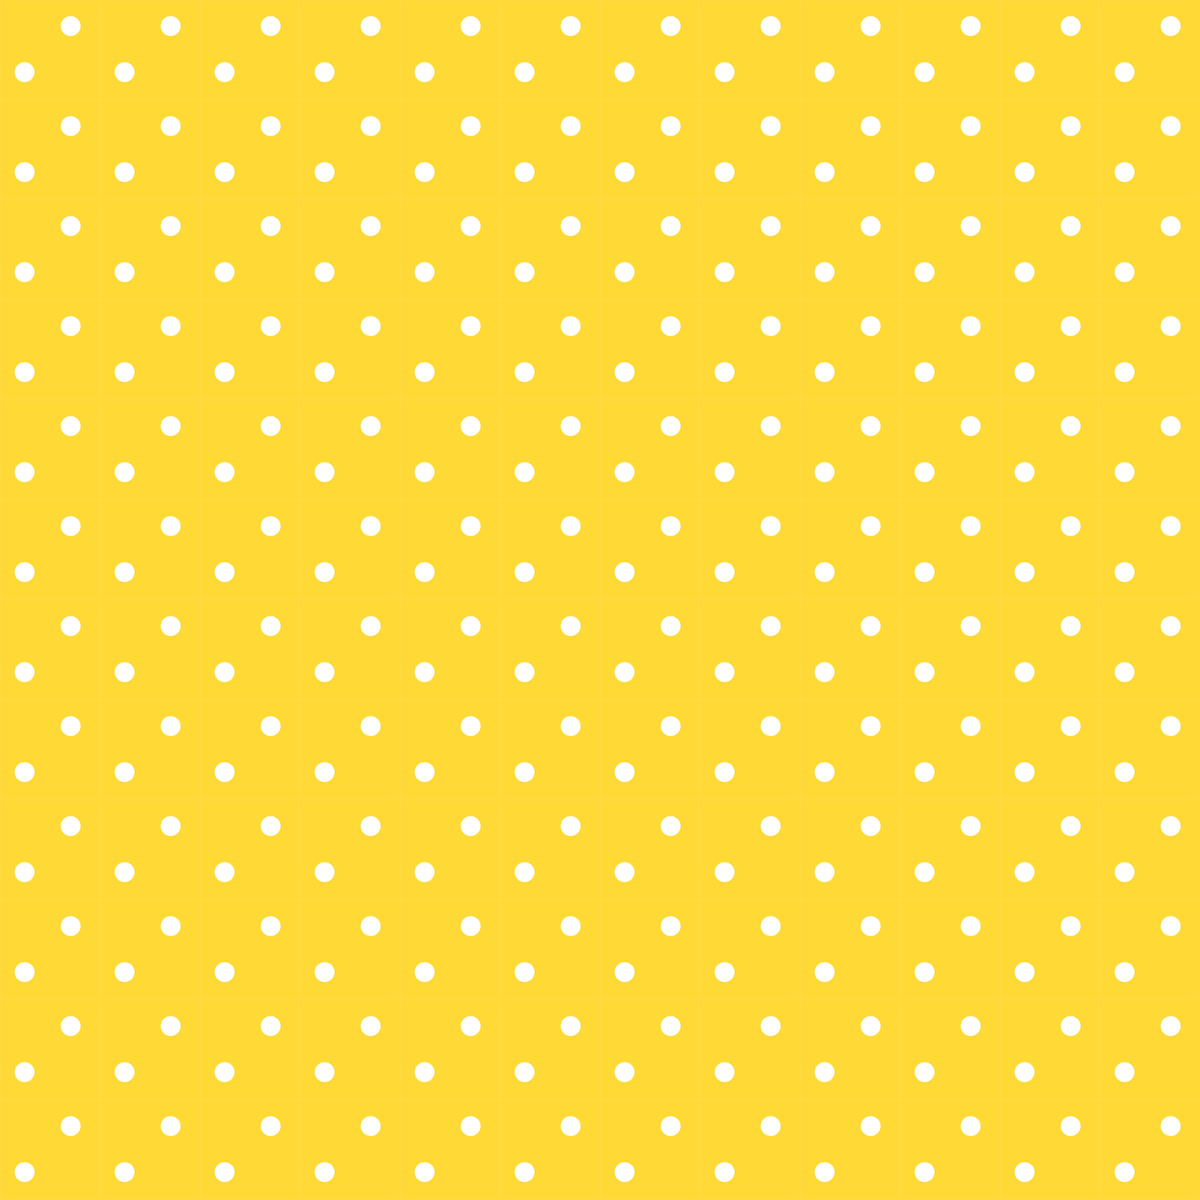 Scrapbook paper companies - Free Polka Dot Scrapbook Papers Ausdruckbares Geschenkpapier Freebie Meinlilapark Diy Printables And